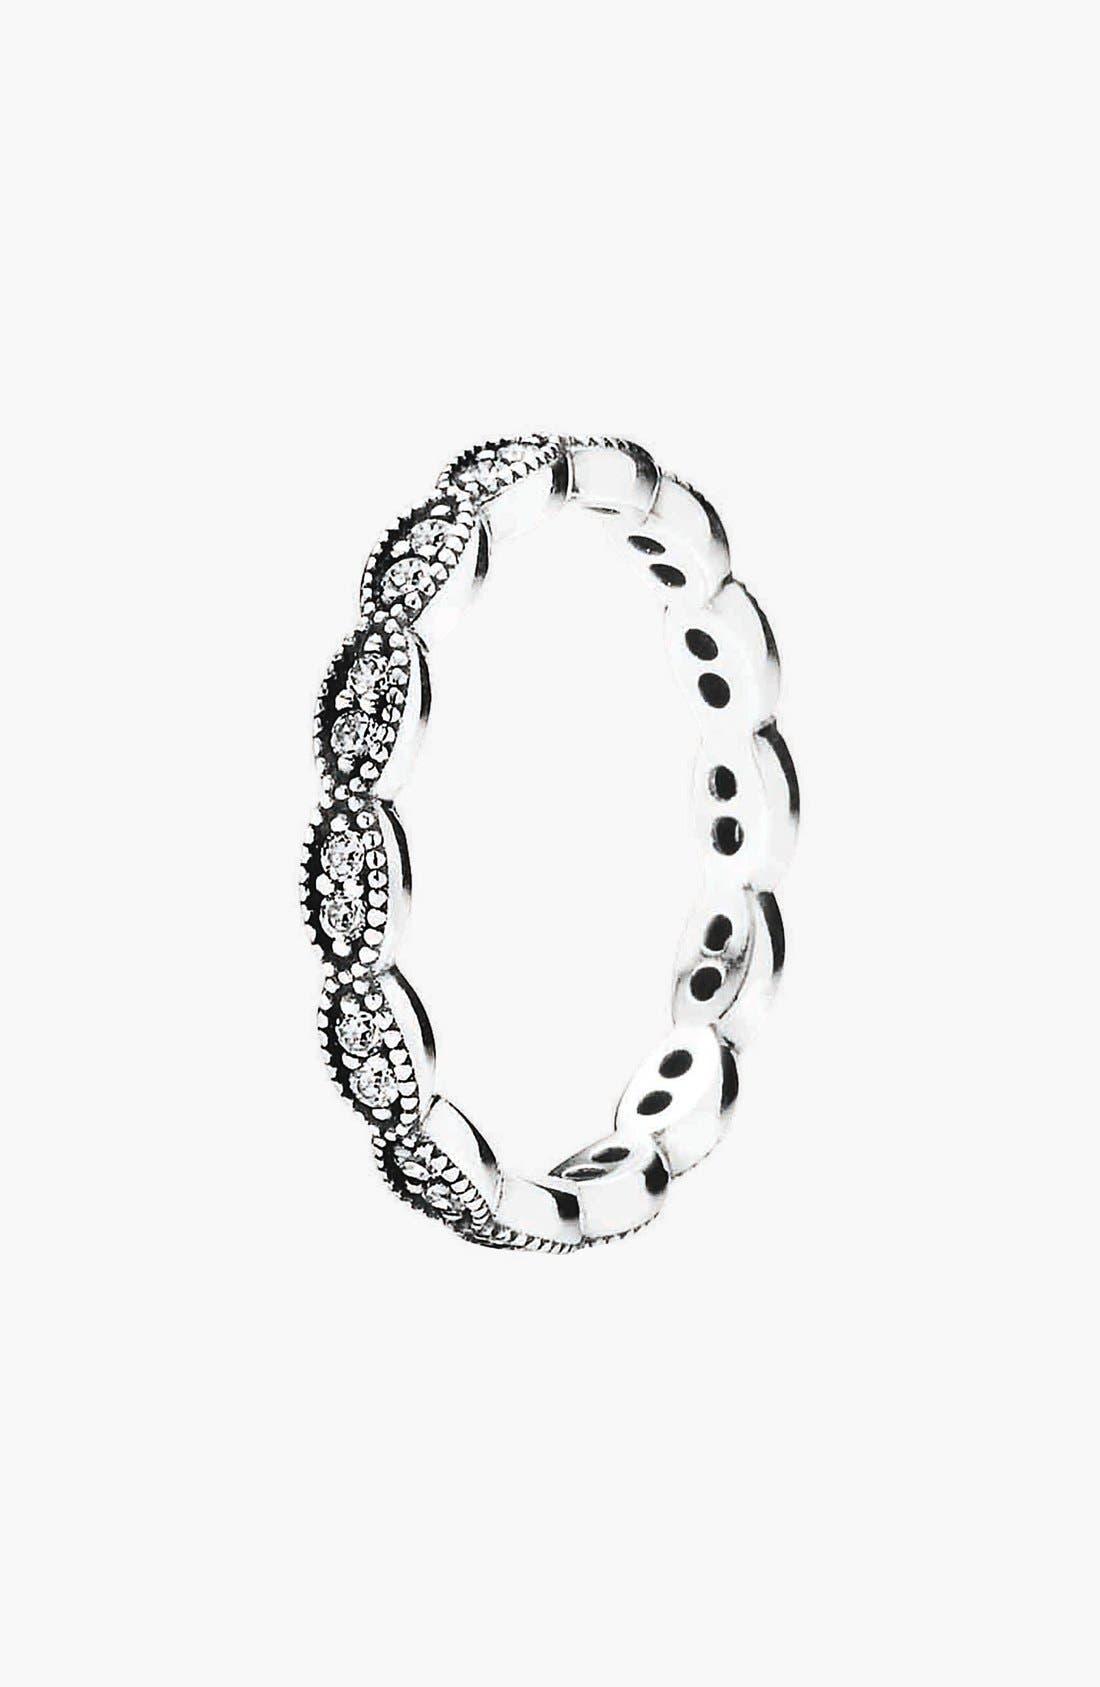 Alternate Image 1 Selected - PANDORA 'Sparkling Leaves' Band Ring